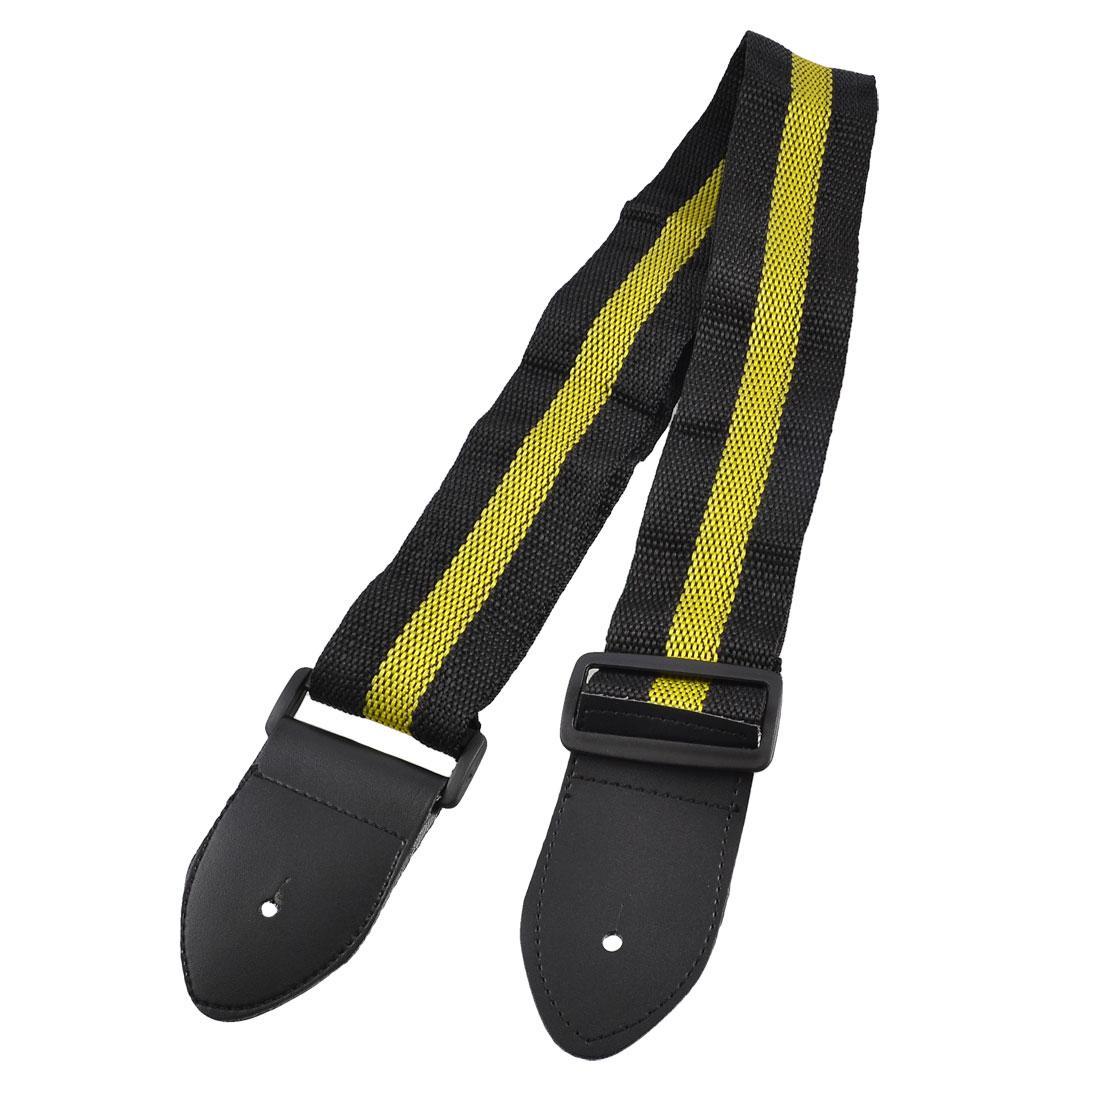 "1.9"" Width Black Yellow Nylon Weave Guitar Strap Shoulder Band"